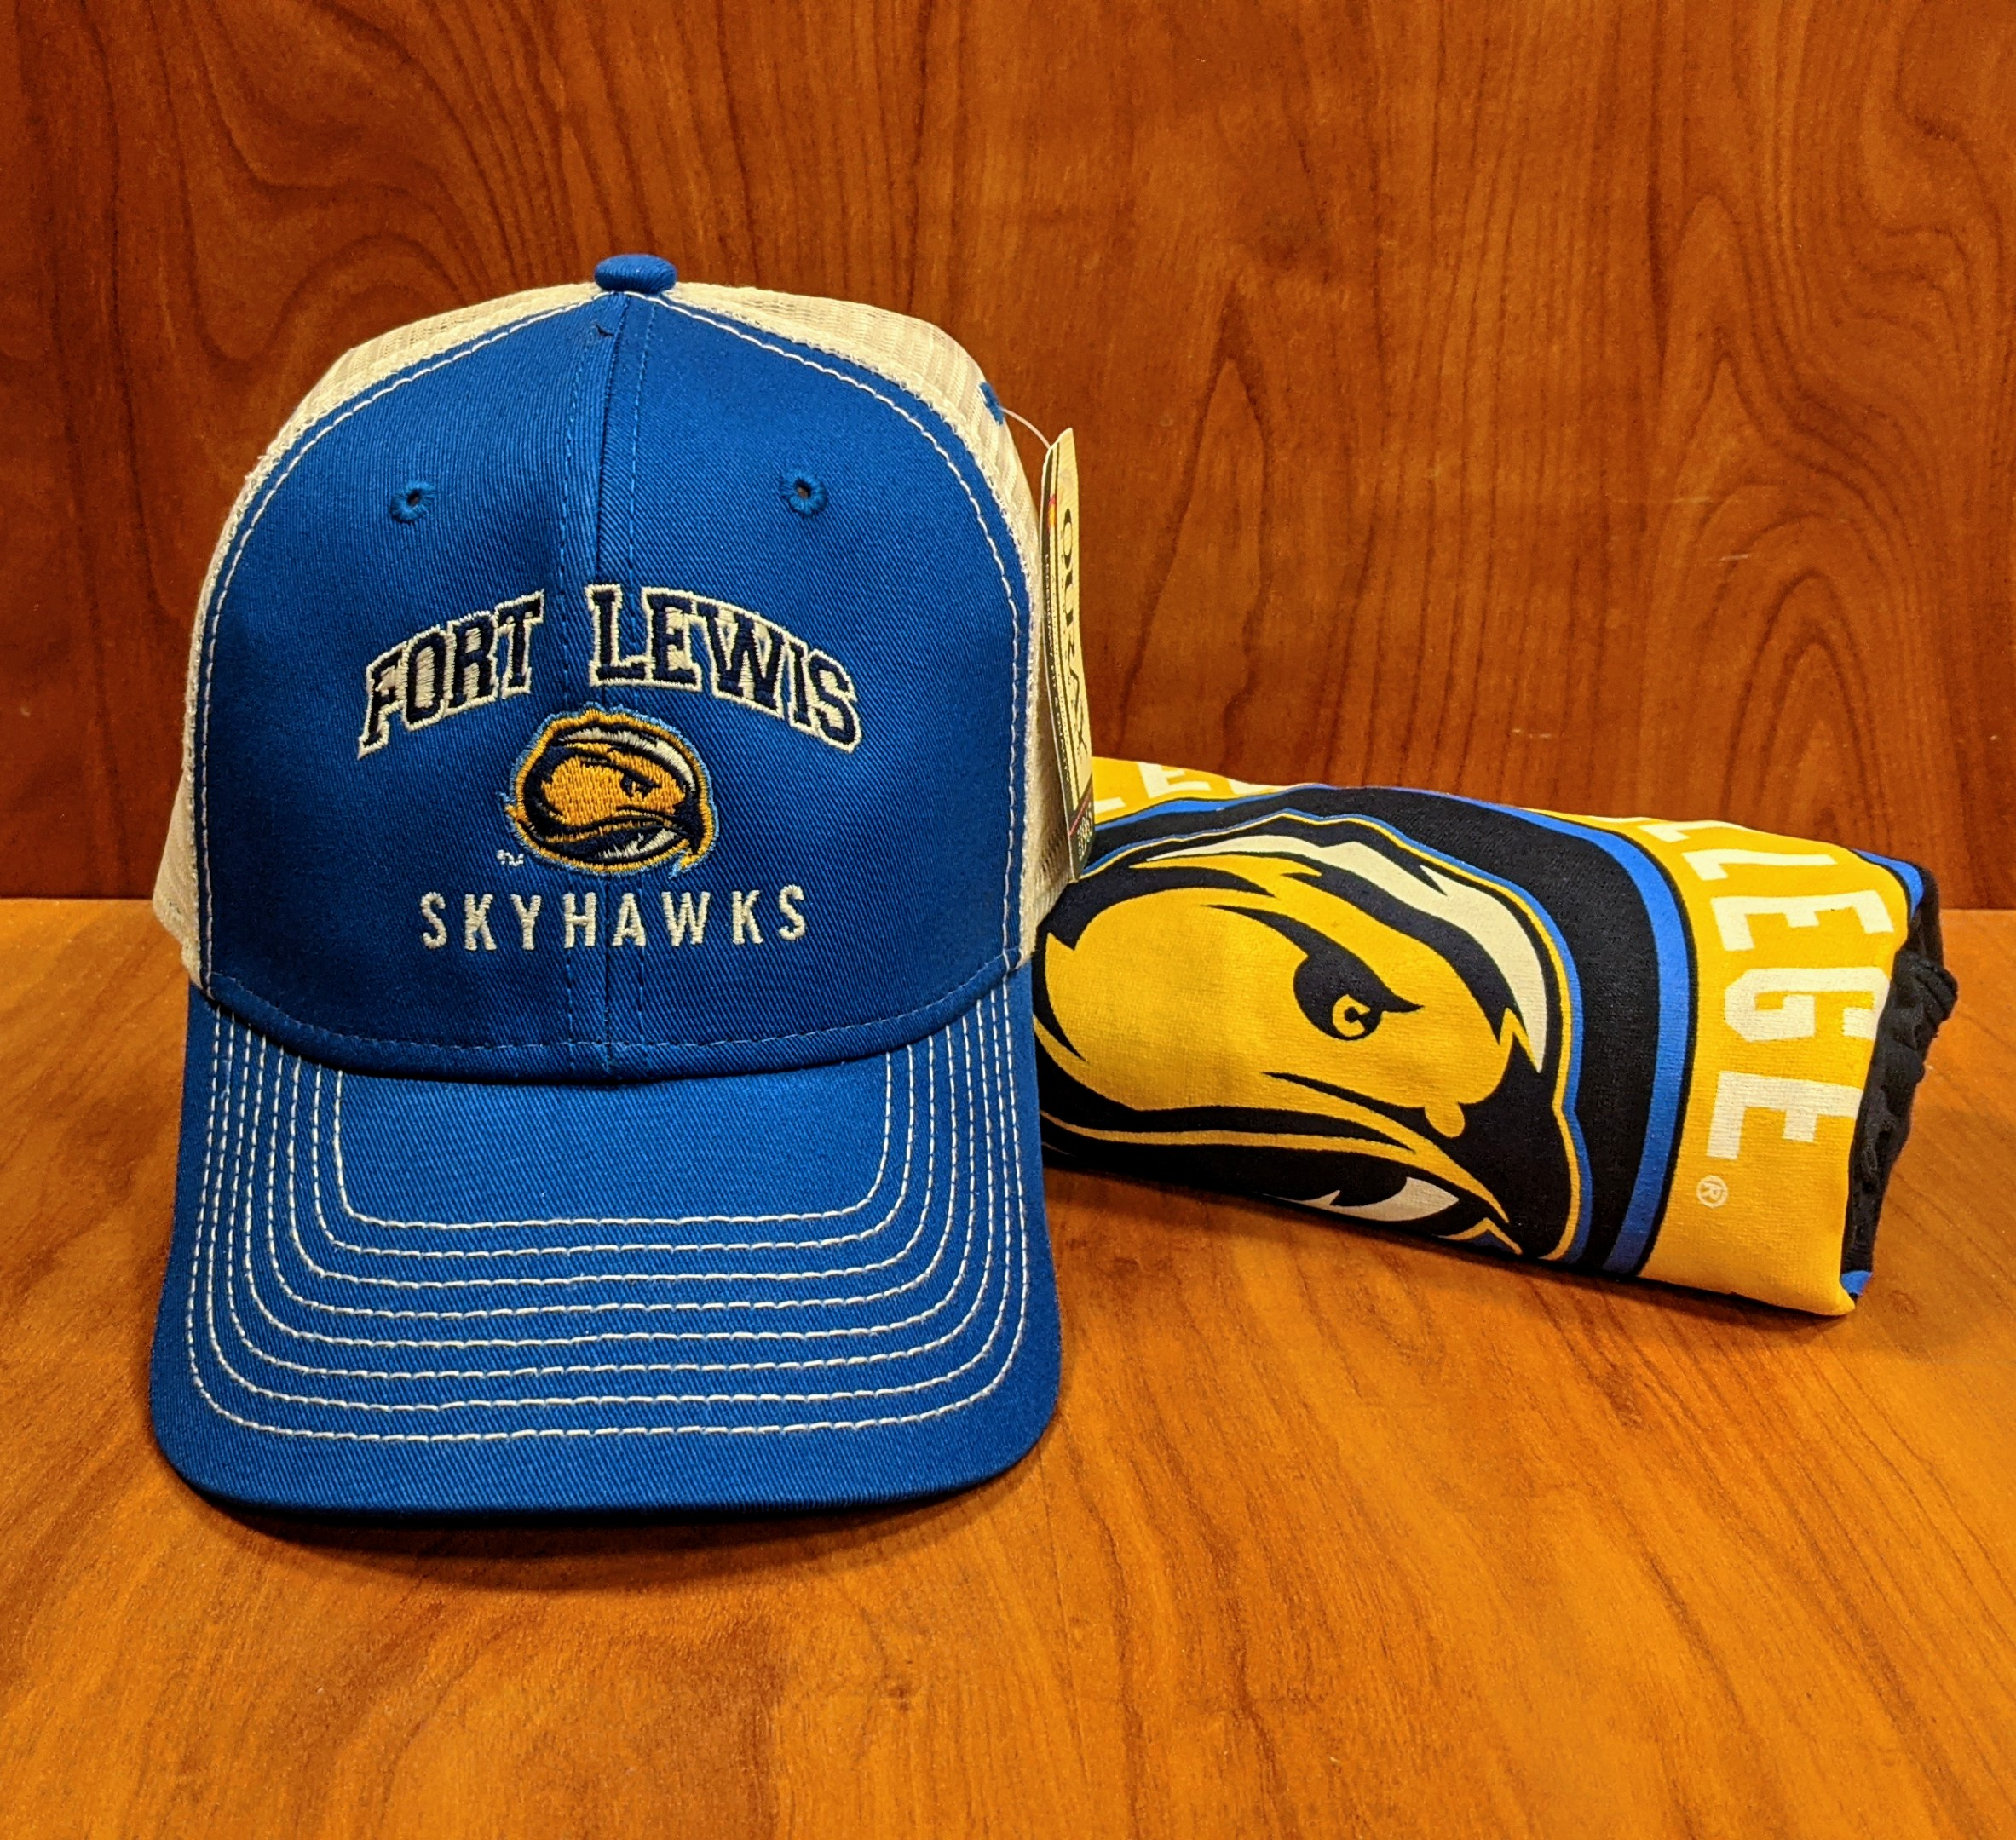 Fort Lewis Skyhawks Hat and T-Shirt Bundle